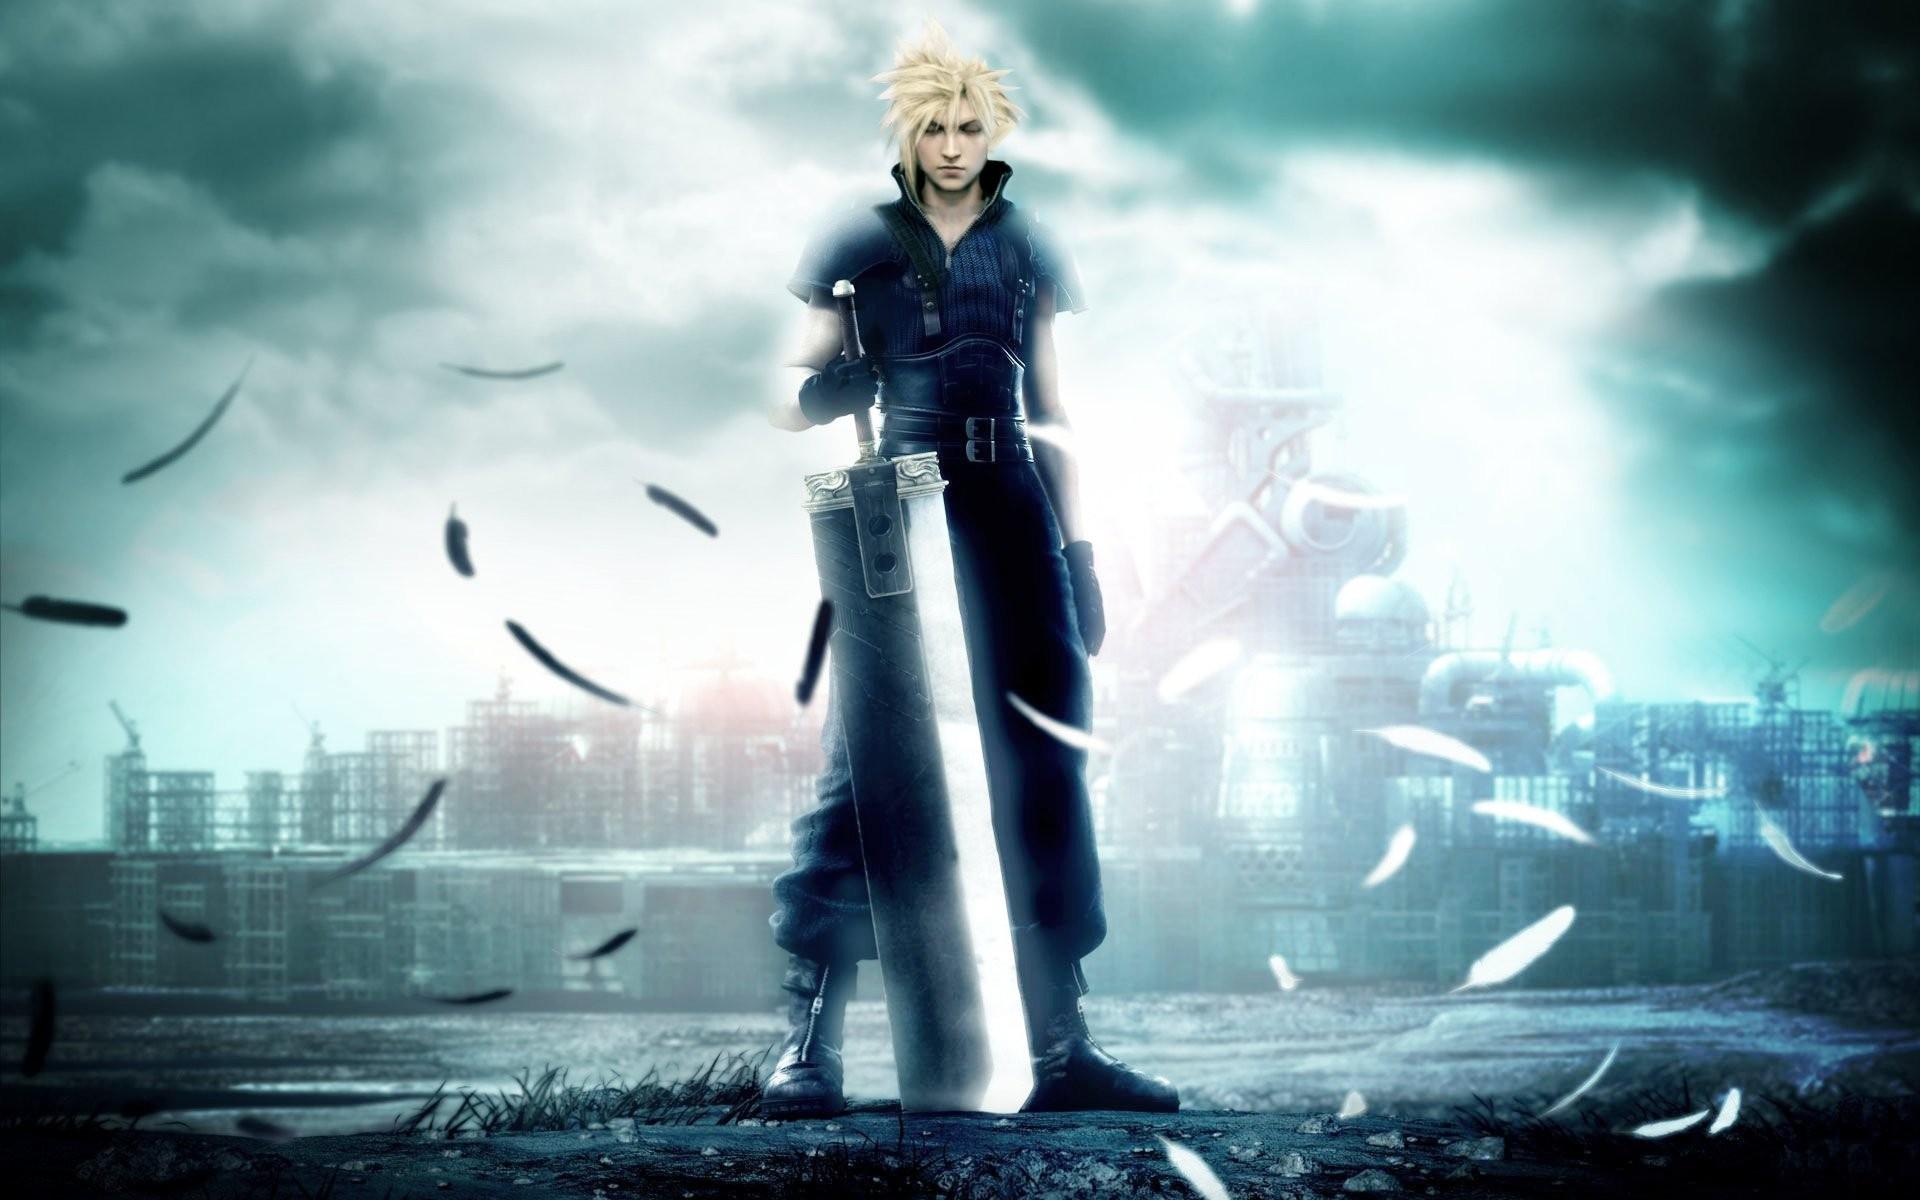 Wallpaper Video Games Final Fantasy Vii Cloud Strife Final